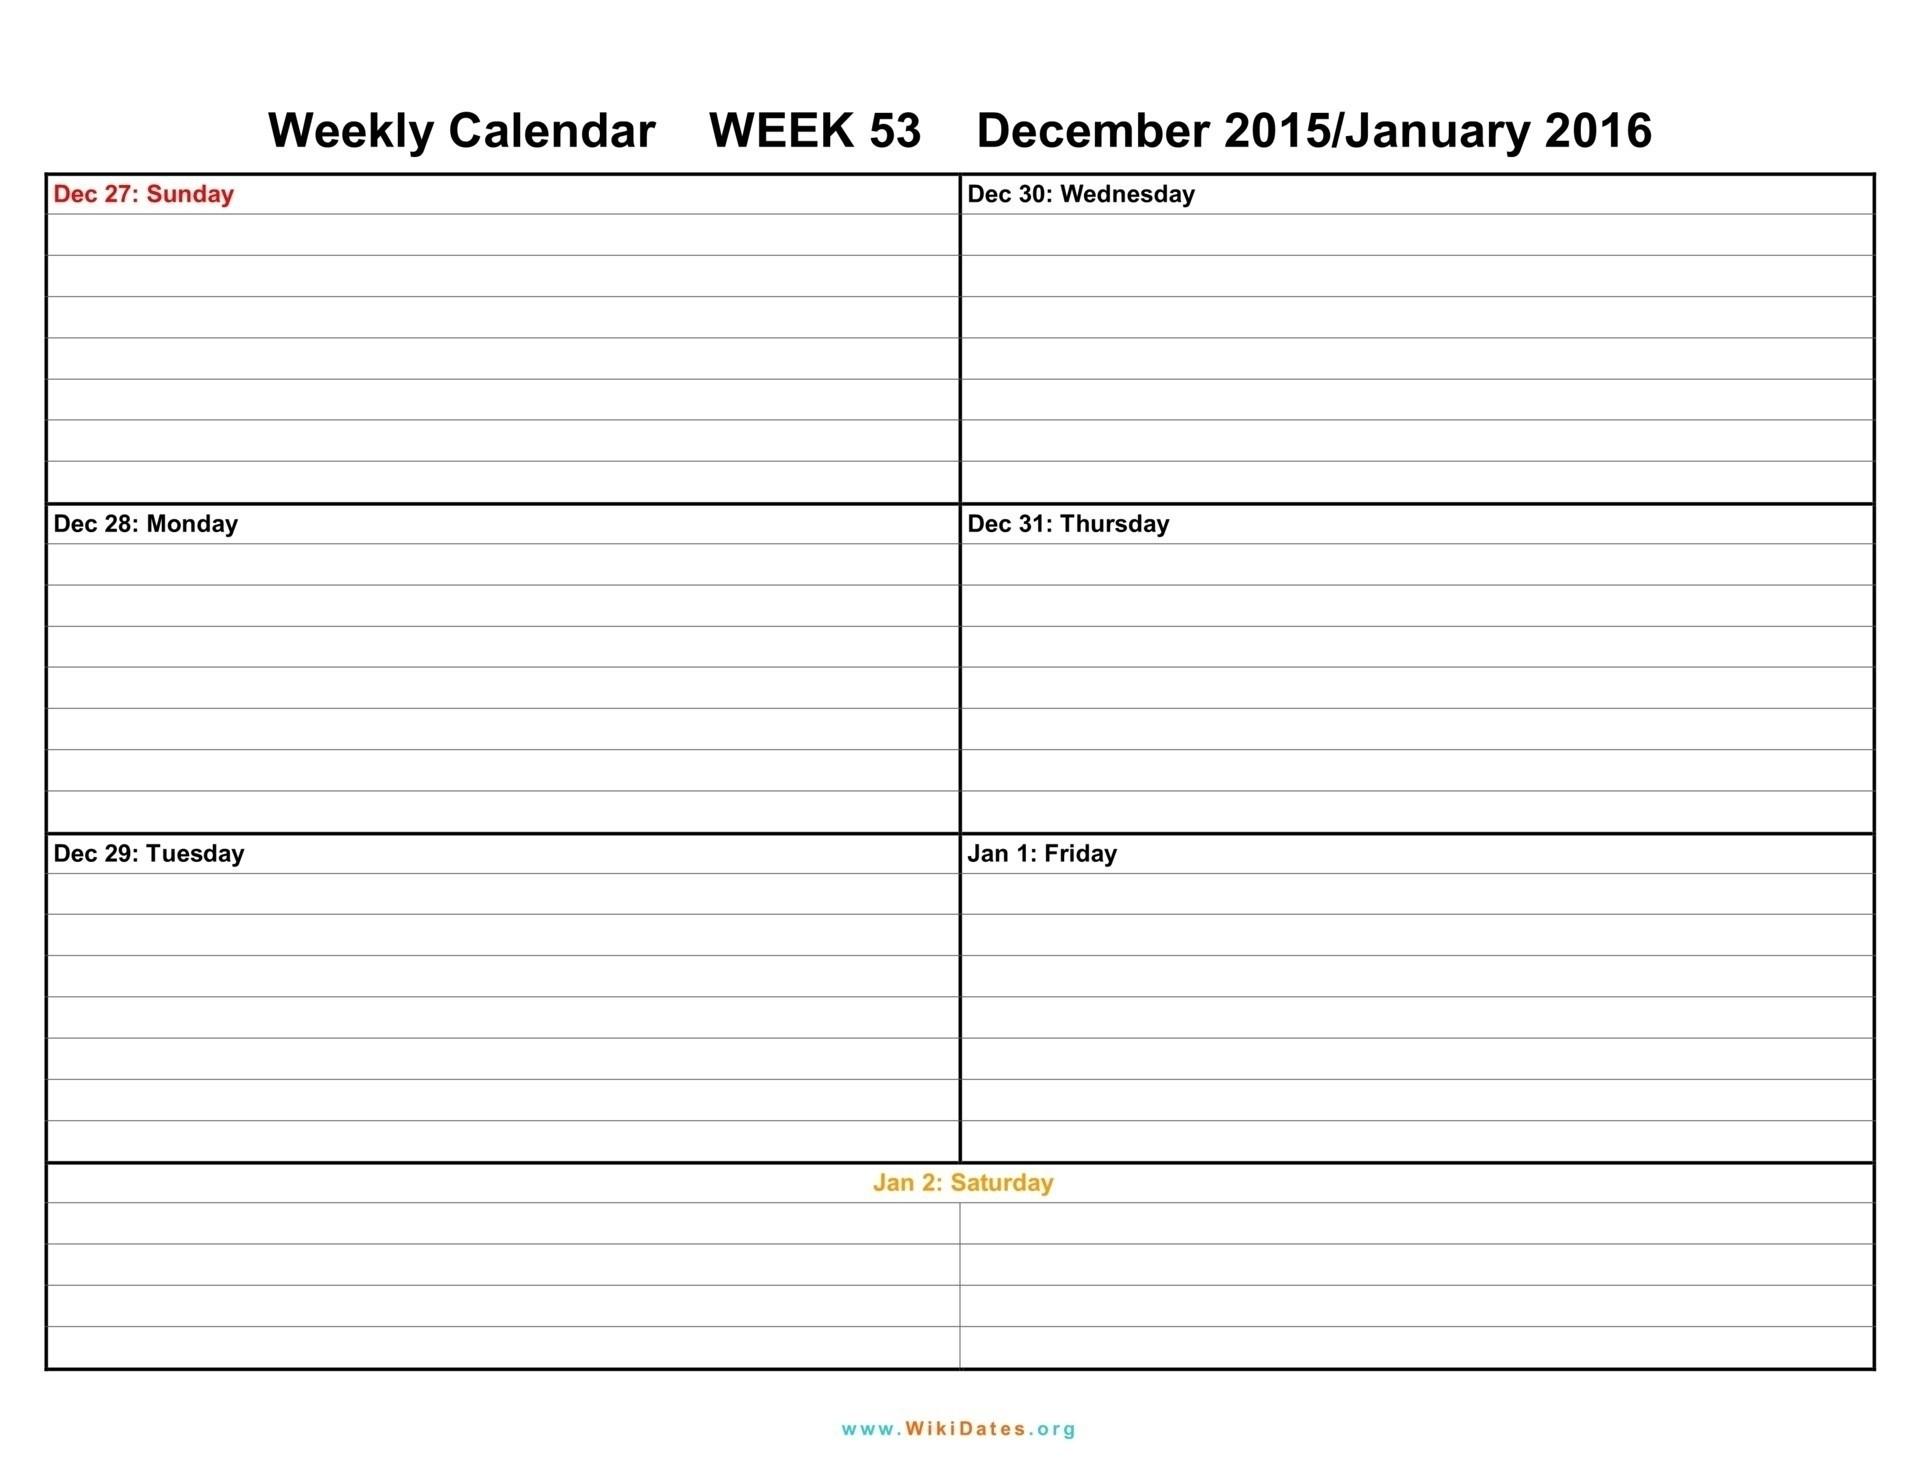 Schedule Template Blank Weekly Printable Calendar May August | Smorad for Blank Calendar For This Week